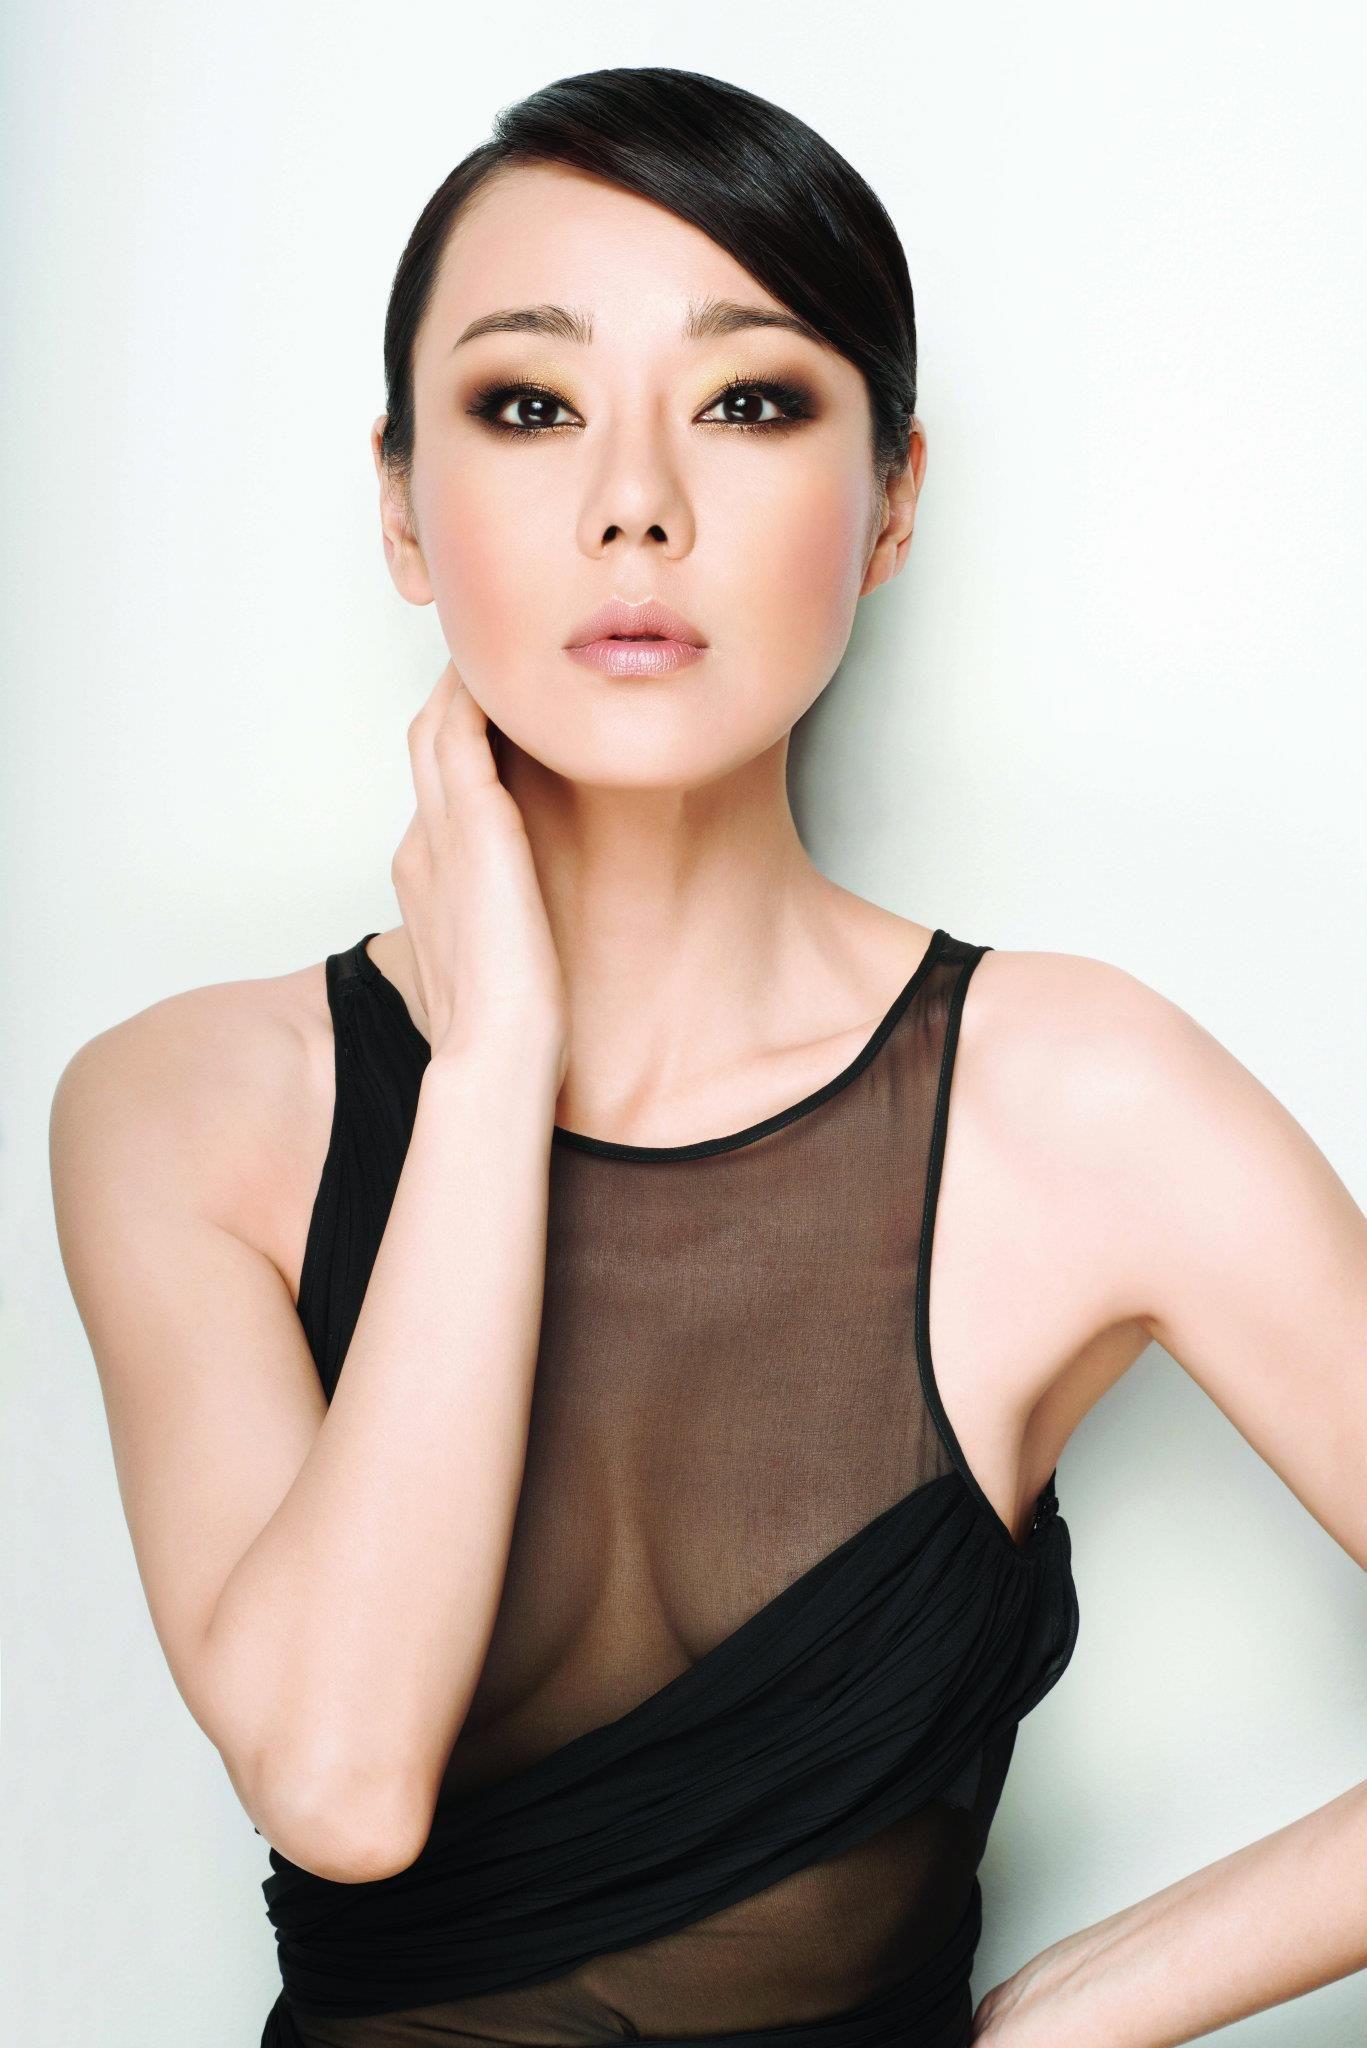 eroticheskie-foto-yunzhin-kim